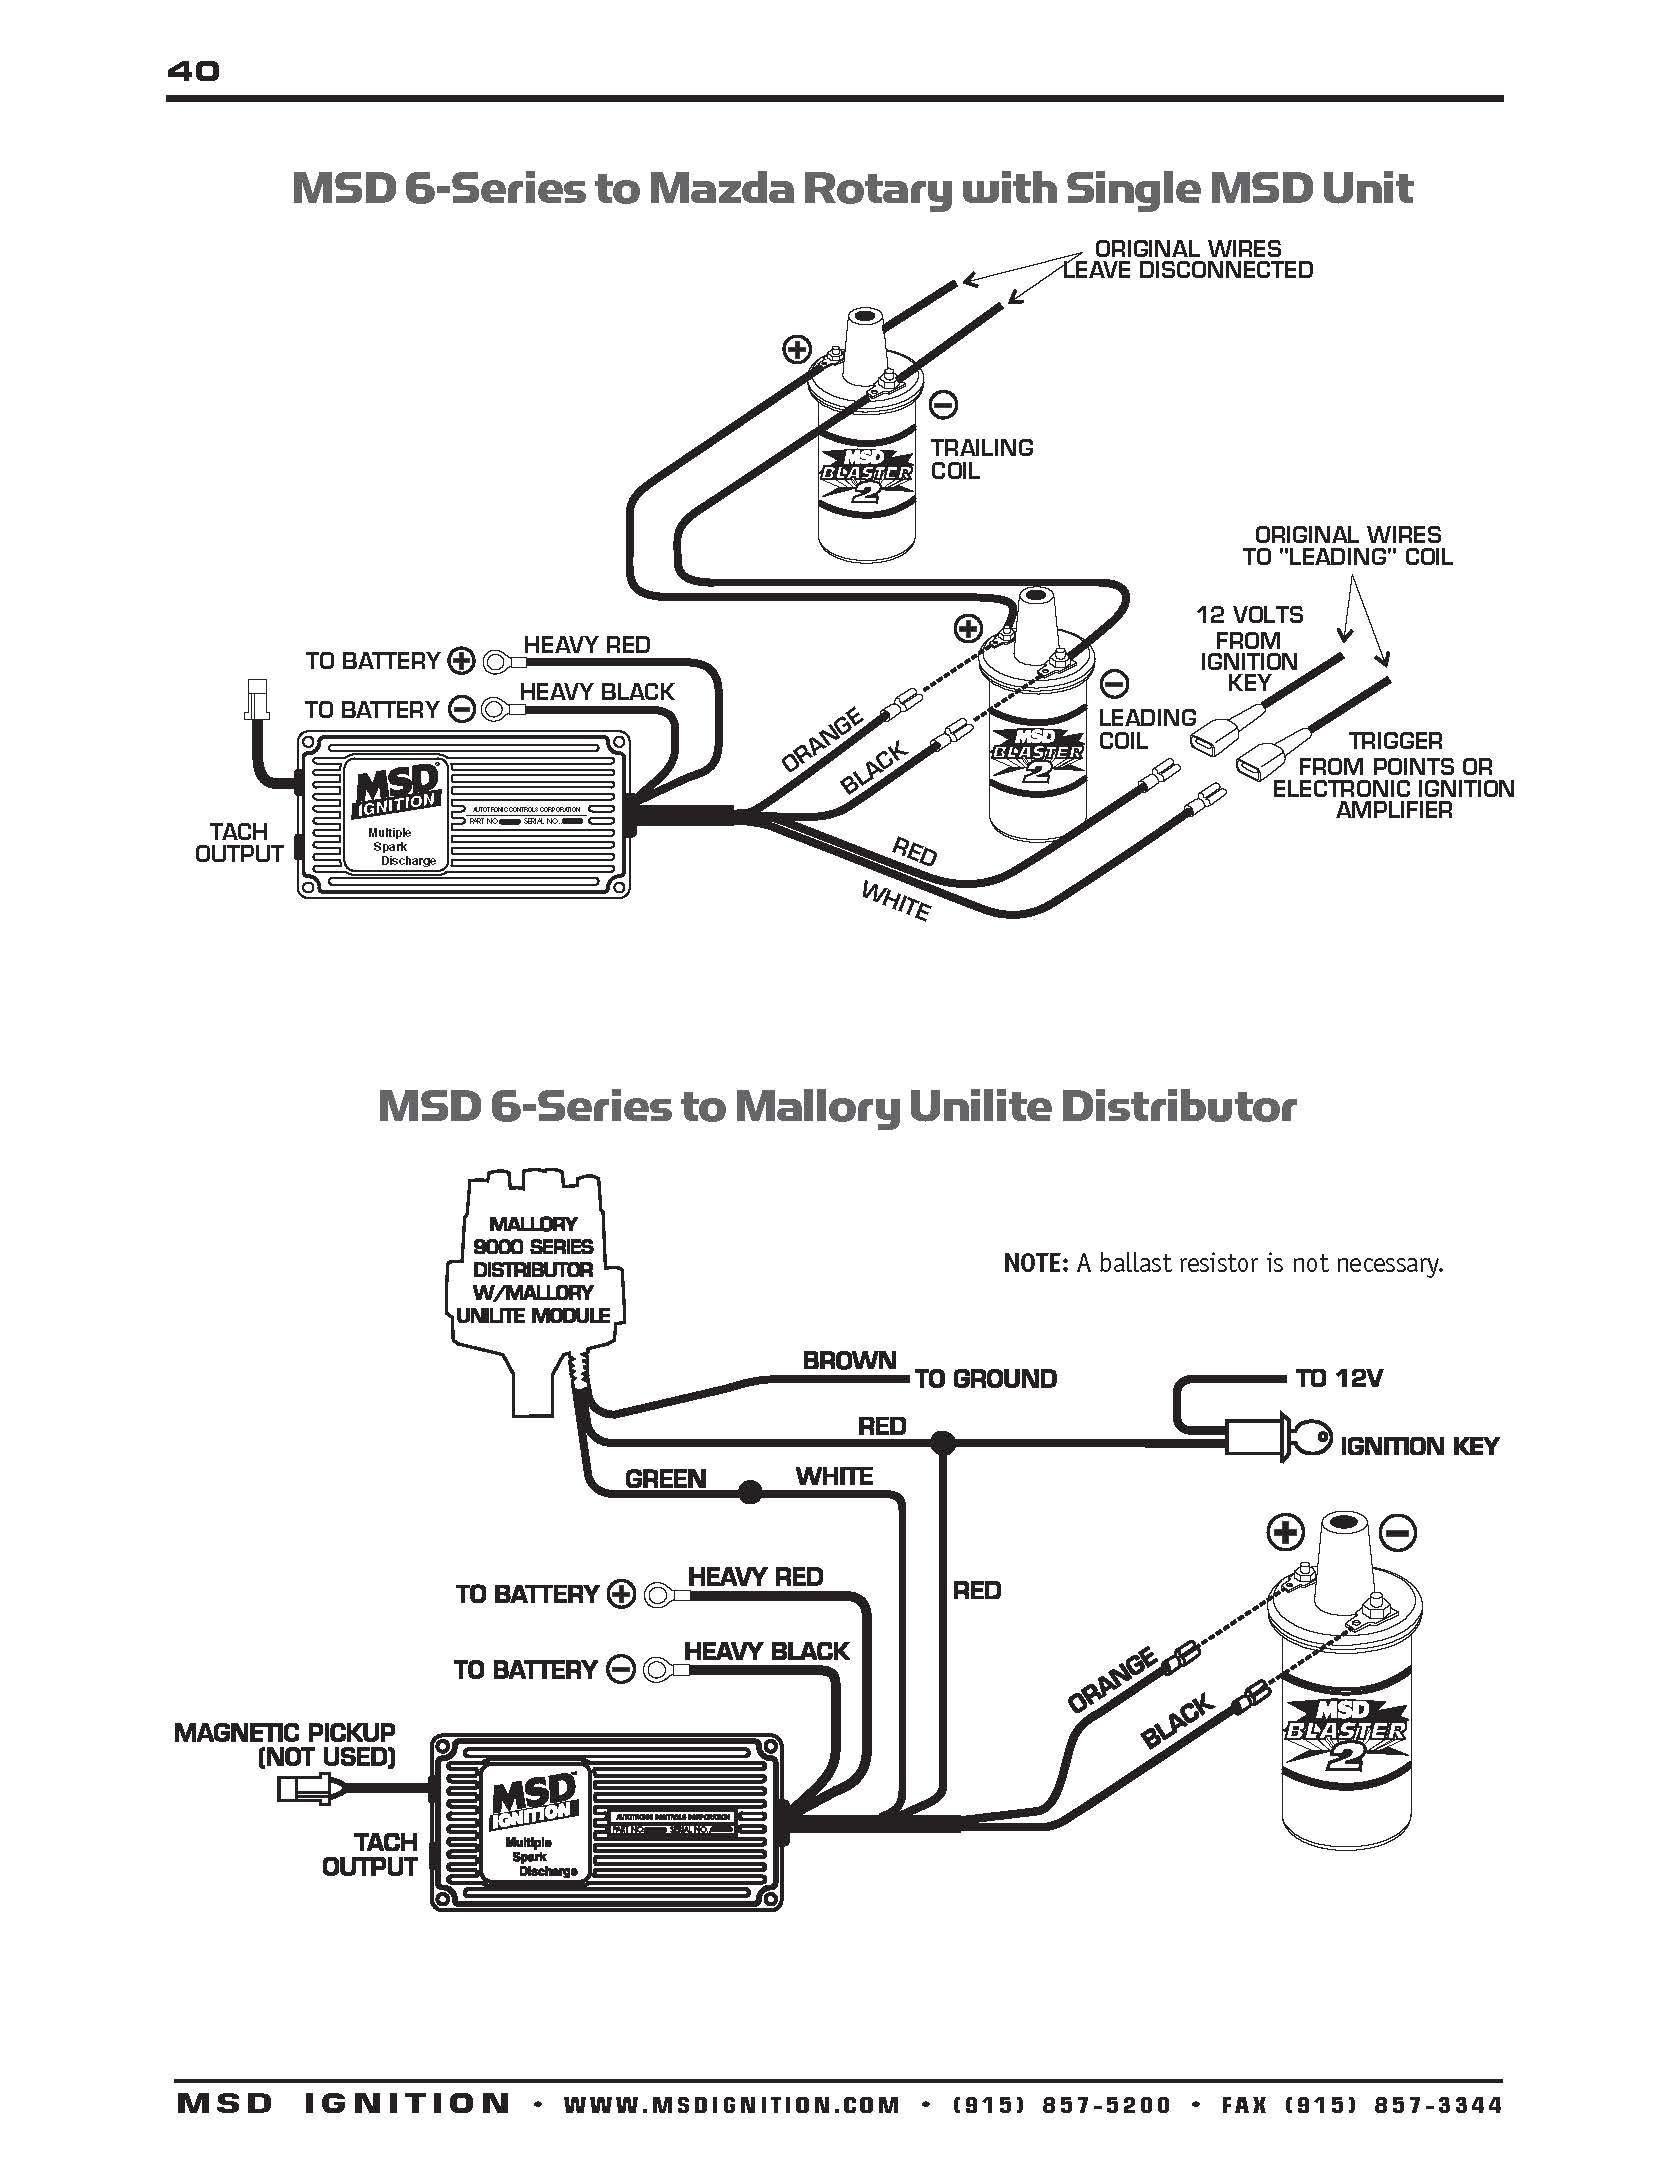 mallory 5048201 wiring diagram wiring diagrams lol mallory 5048201 wiring diagram